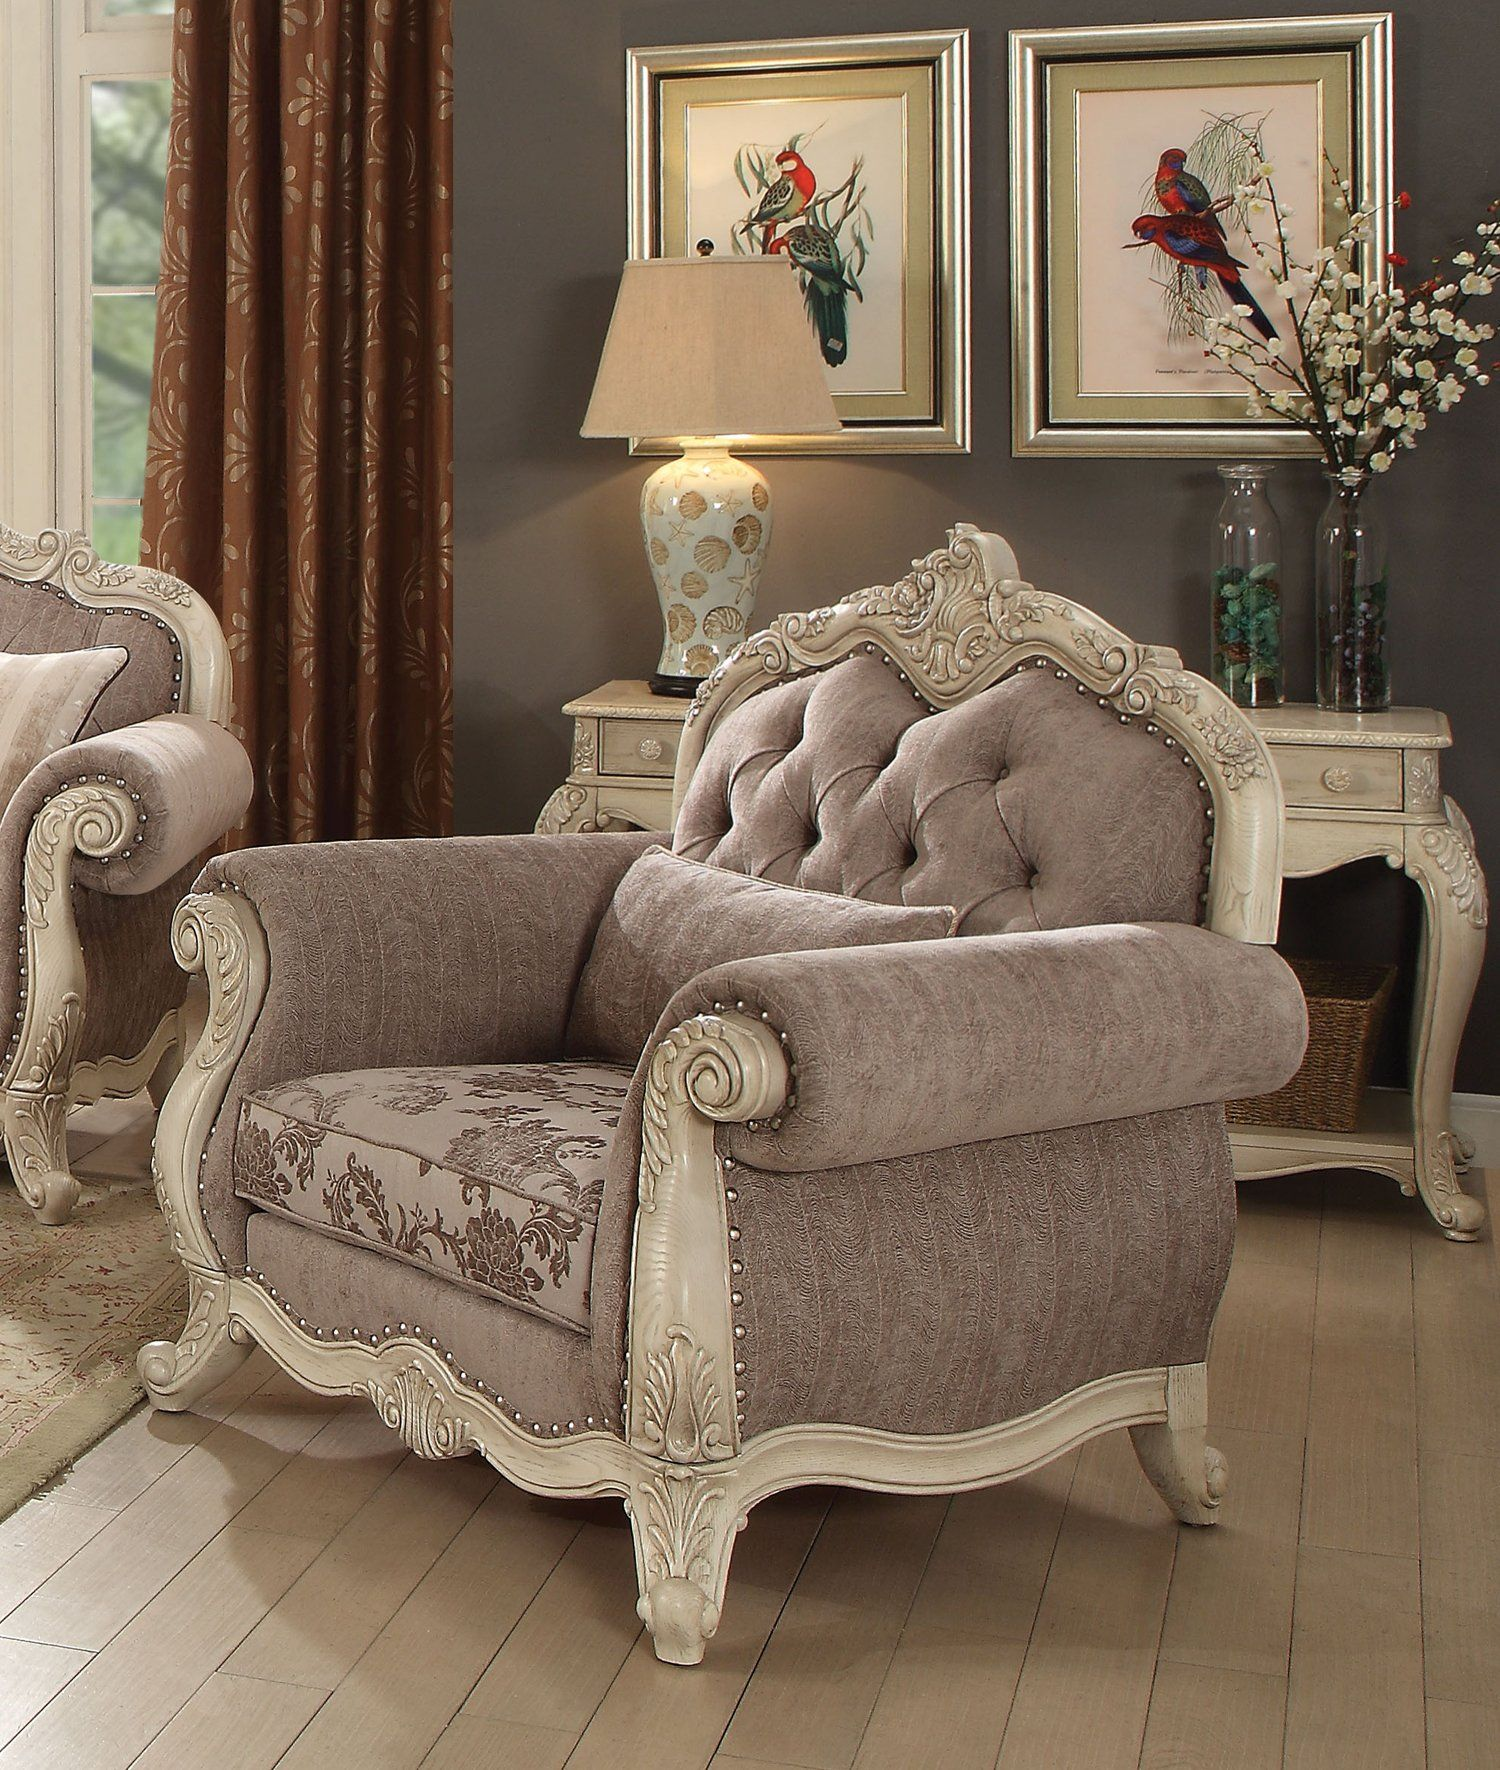 Acme Ragenardus Antique White Chair In 2020 Furniture